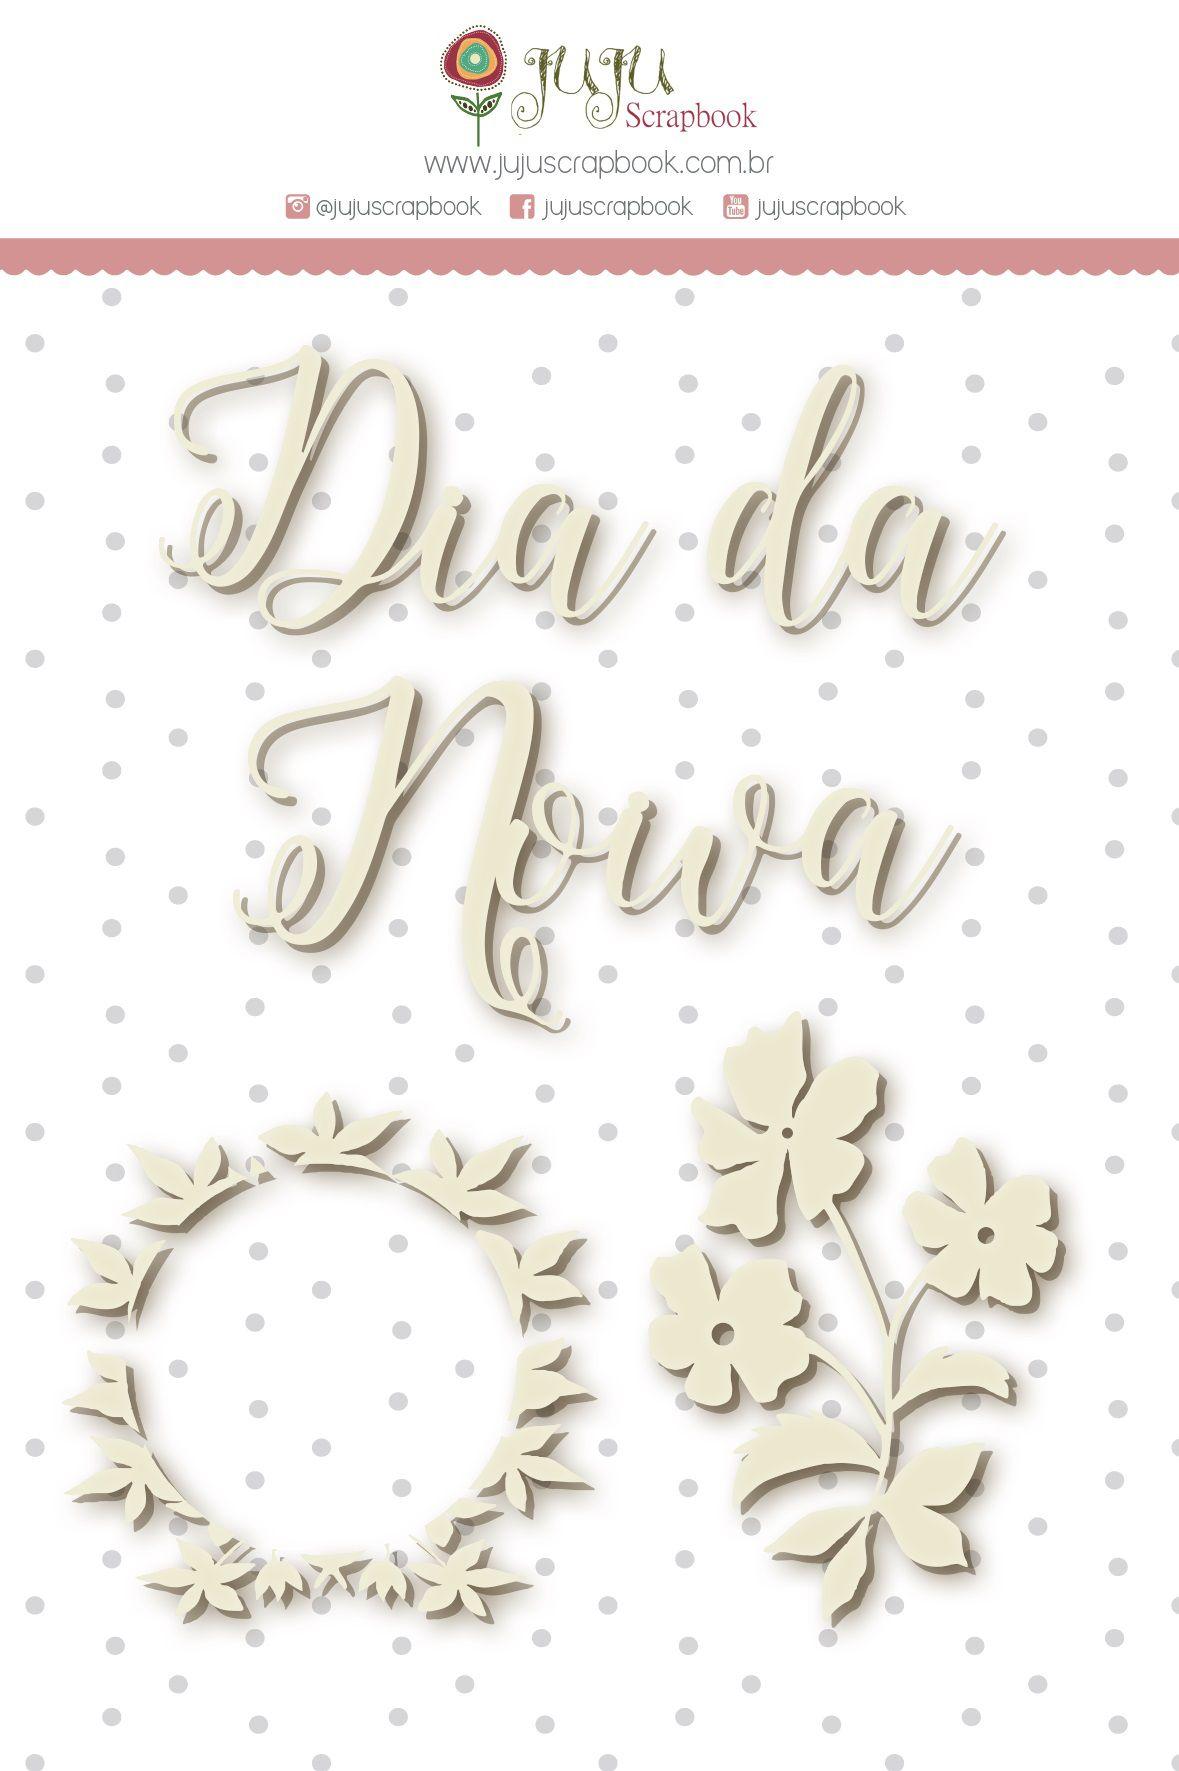 Enfeite Chipboard Branco Dia de Noiva - Coleção Felizes Para Sempre - JuJu Scrapbook  - JuJu Scrapbook